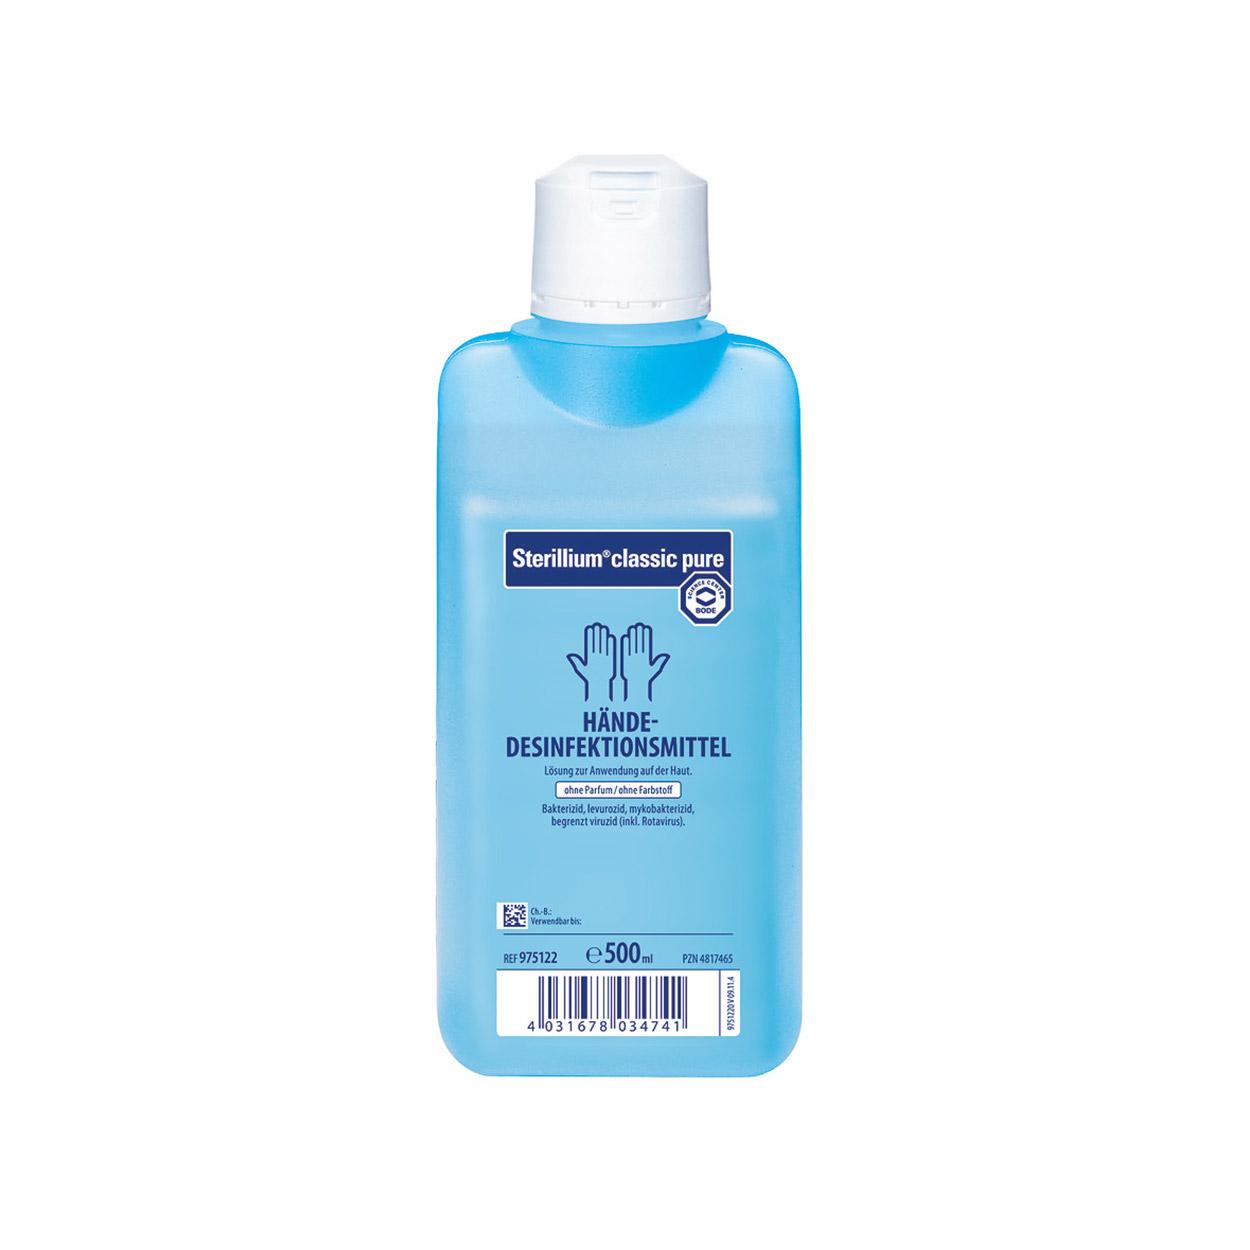 Sterillium® classic pure 500 ml-Flasche